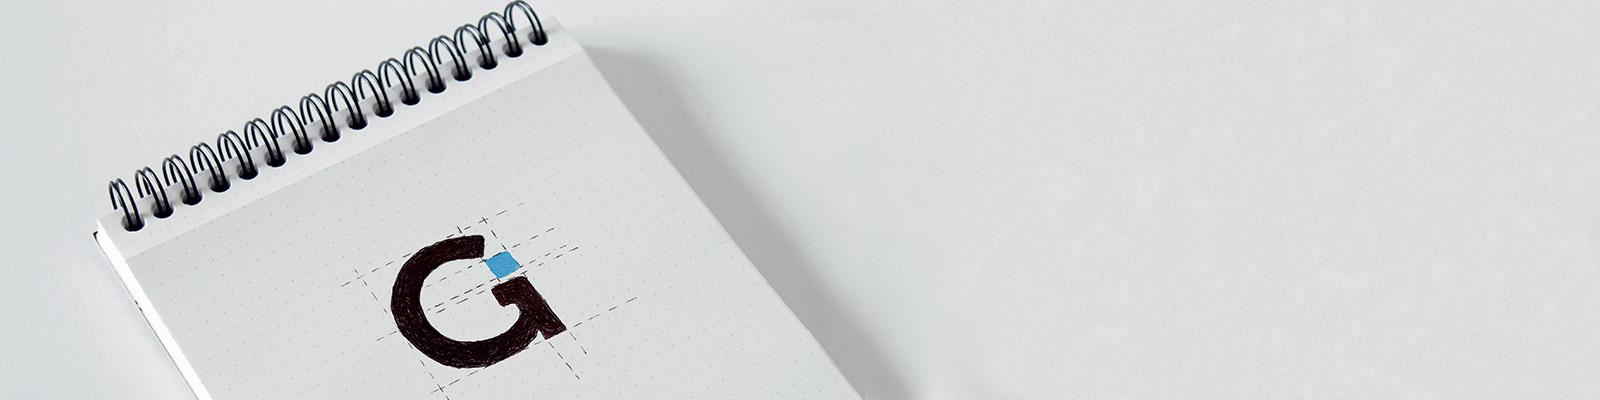 Création de logo - Design graphique & Design de marque